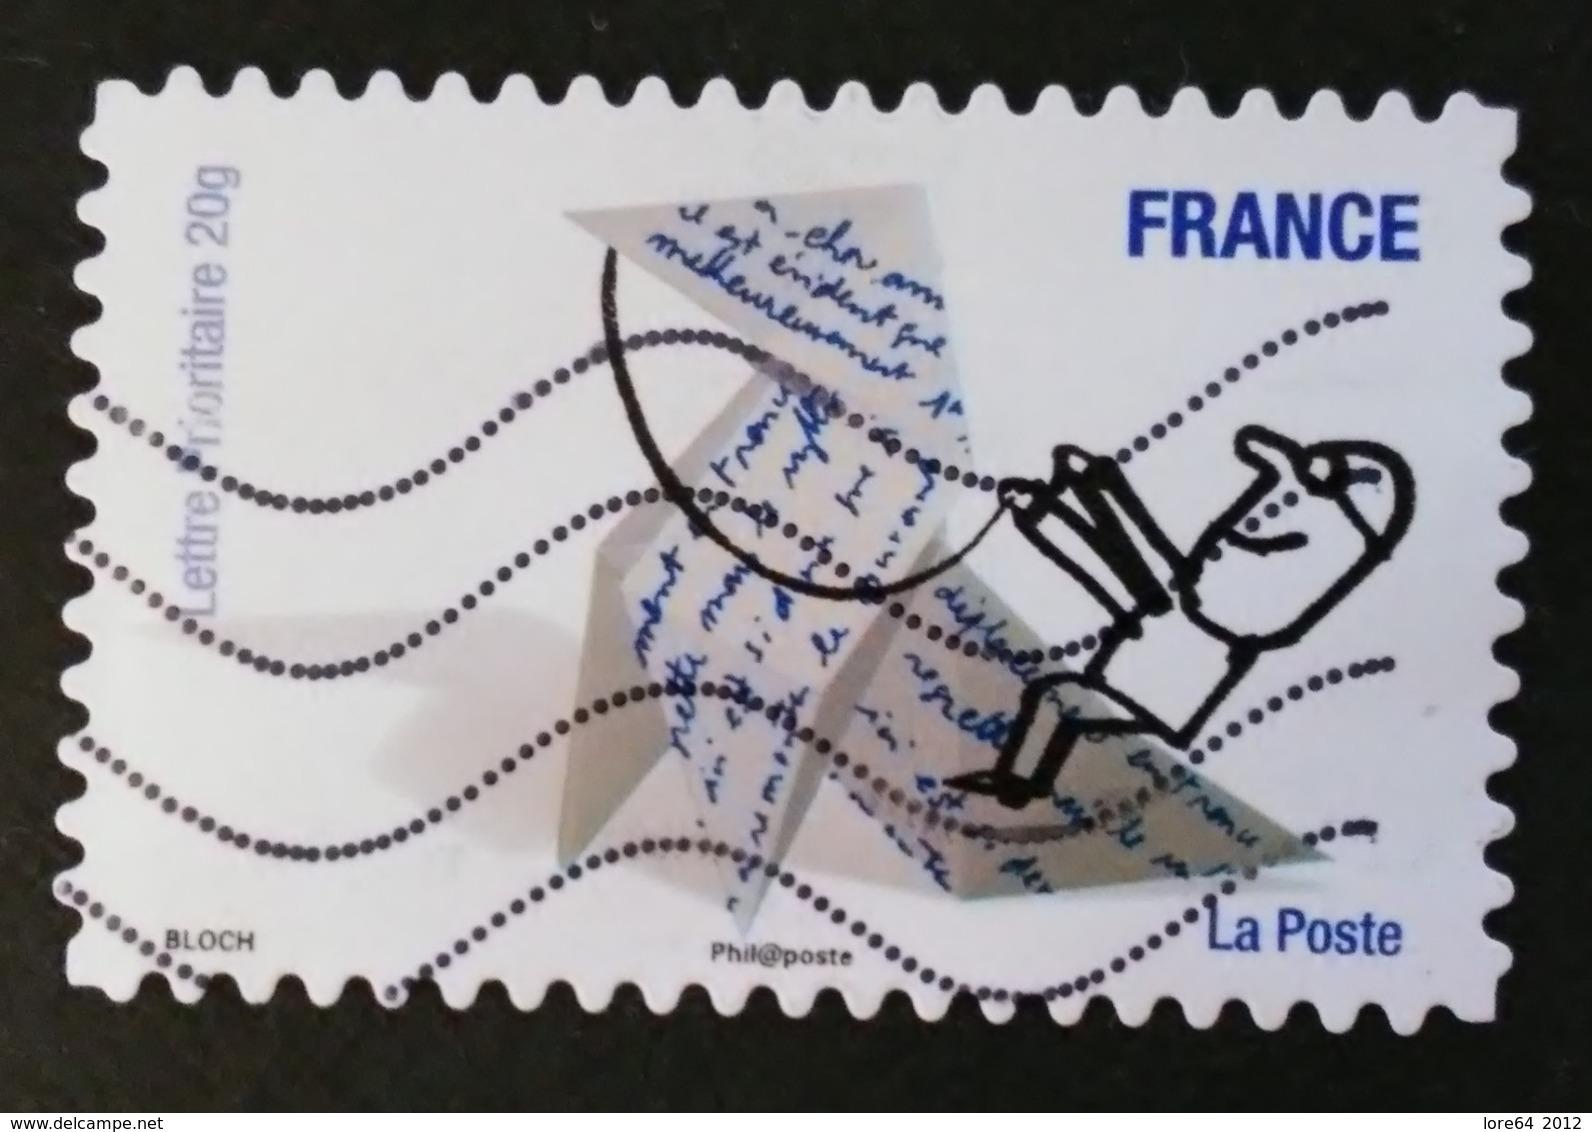 FRANCIA 2010 - 475 - France